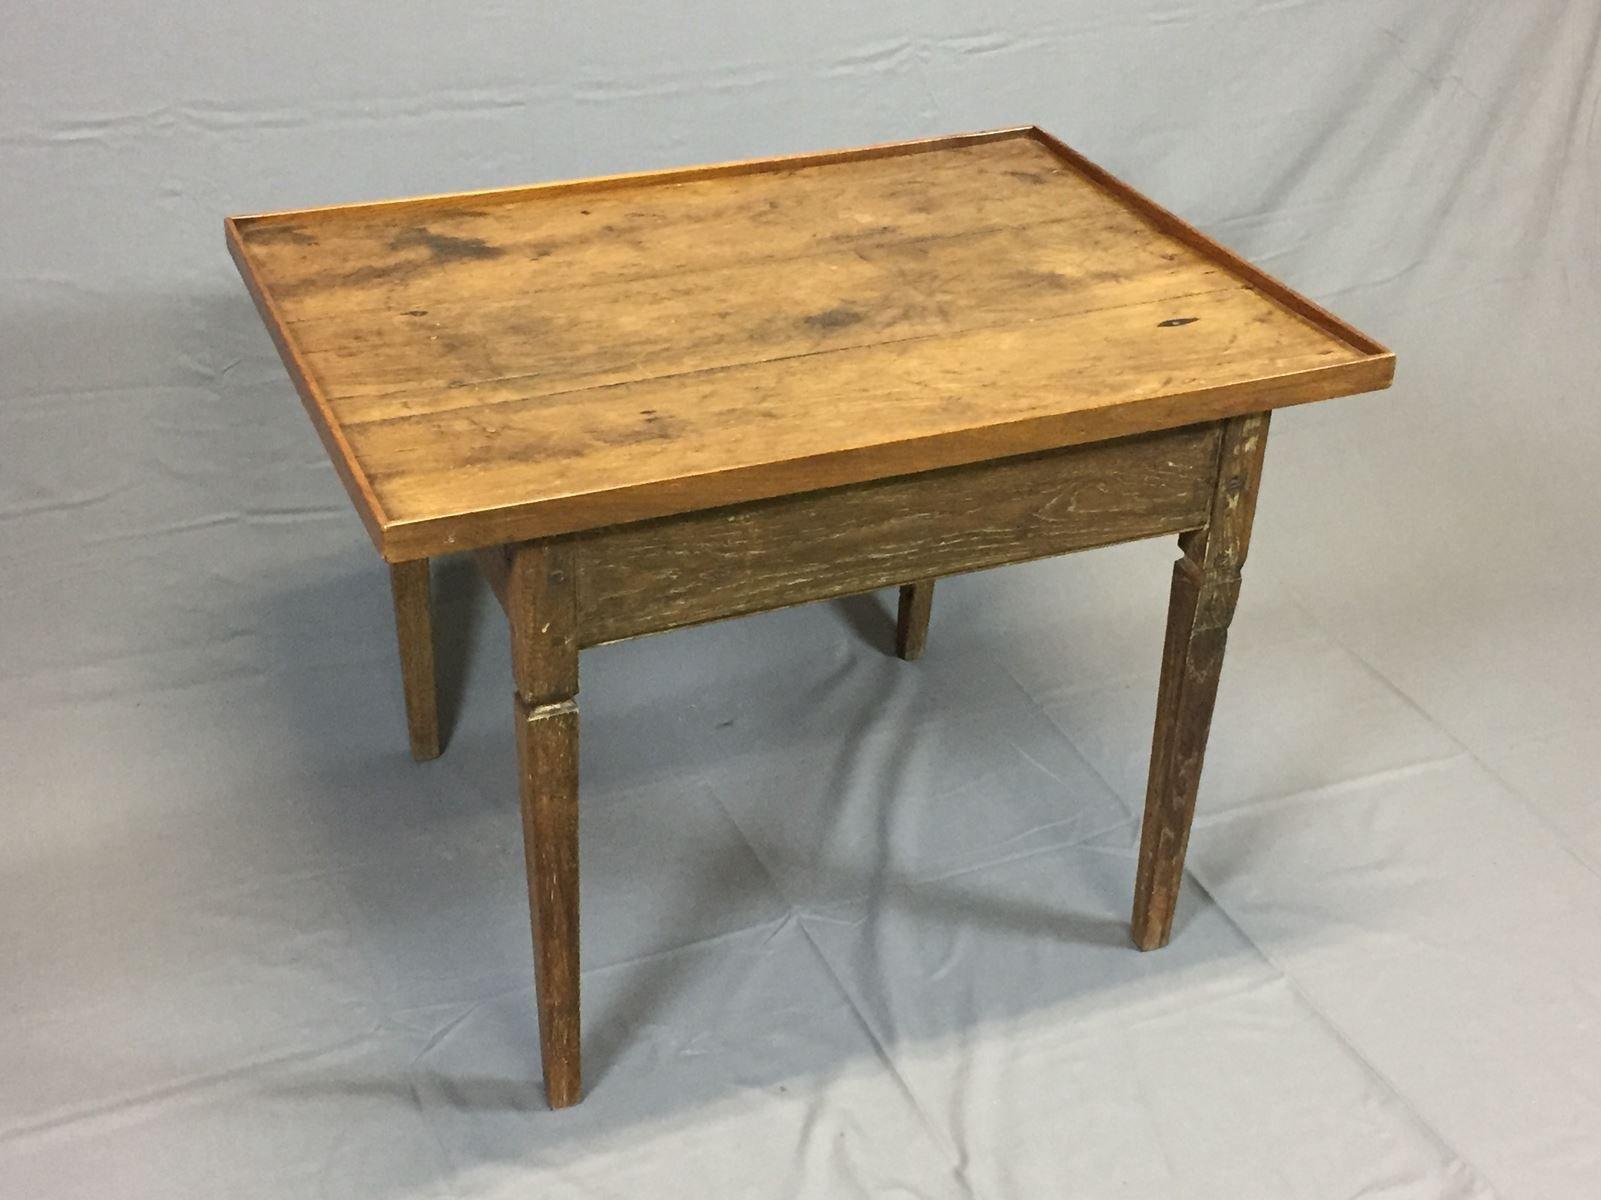 table basse antique en merisier en vente sur pamono. Black Bedroom Furniture Sets. Home Design Ideas